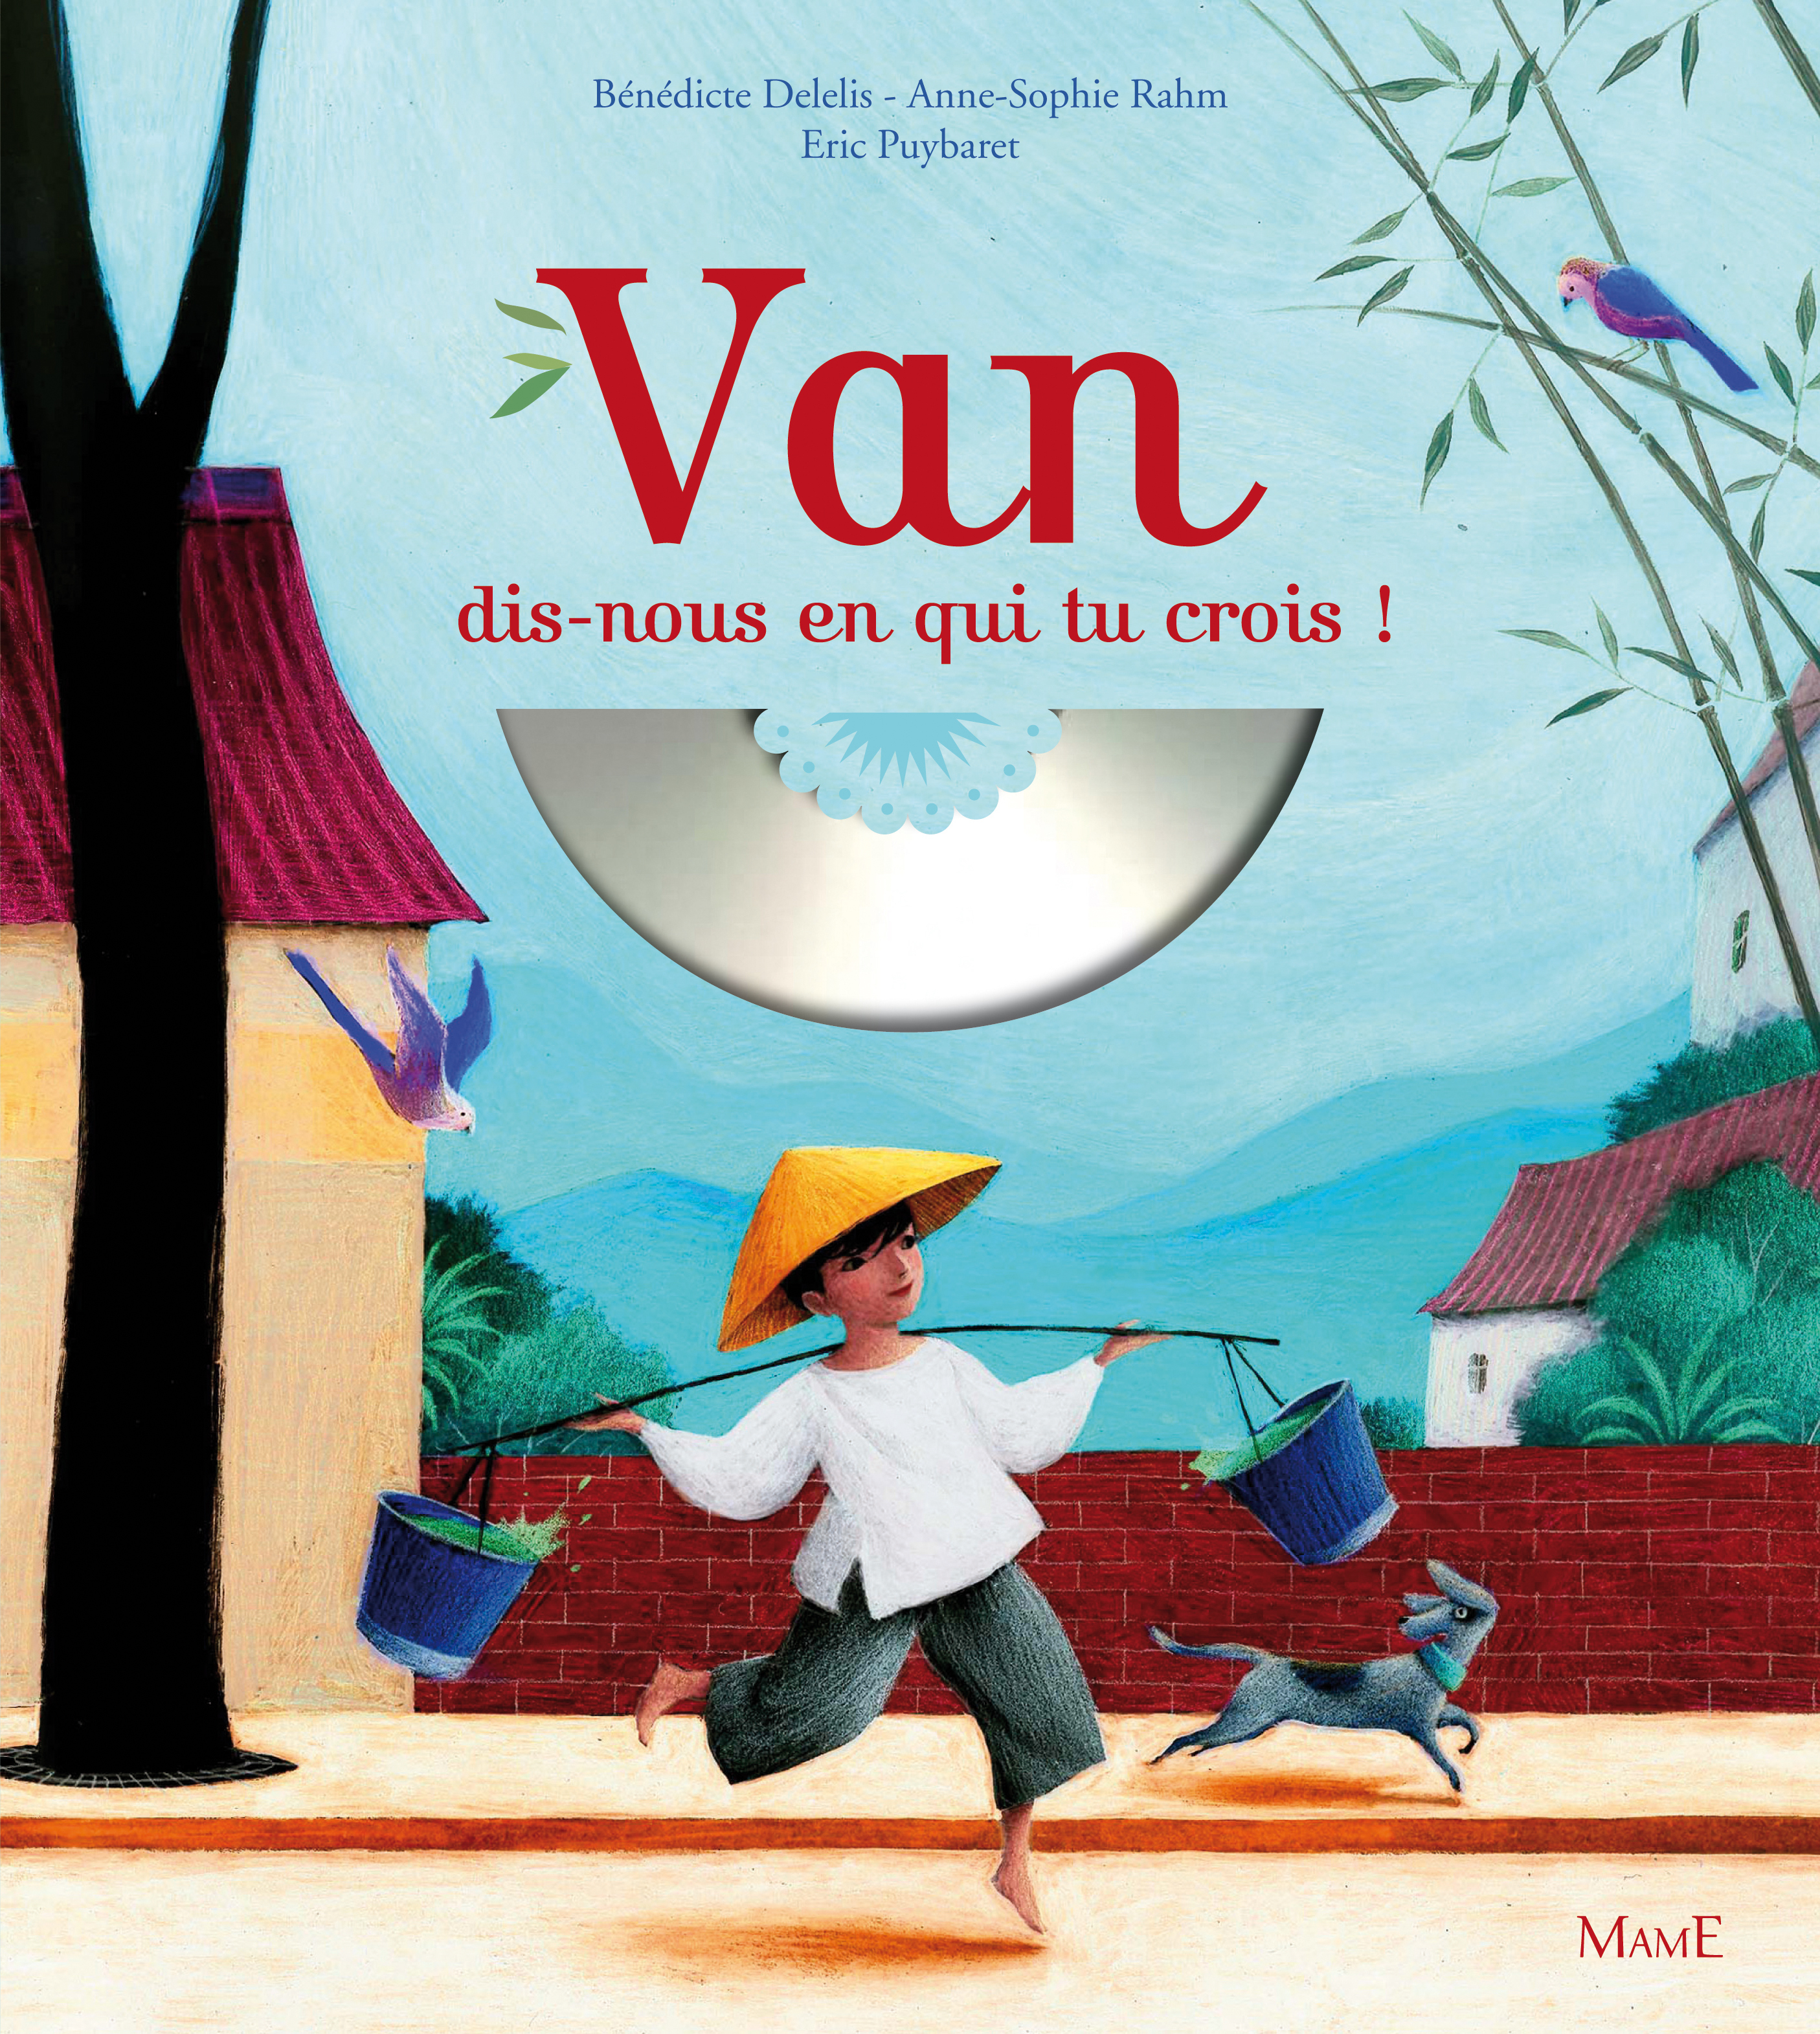 VAN DIS-NOUS EN QUI TU CROIS-CONTE MUSICAL (+CD)